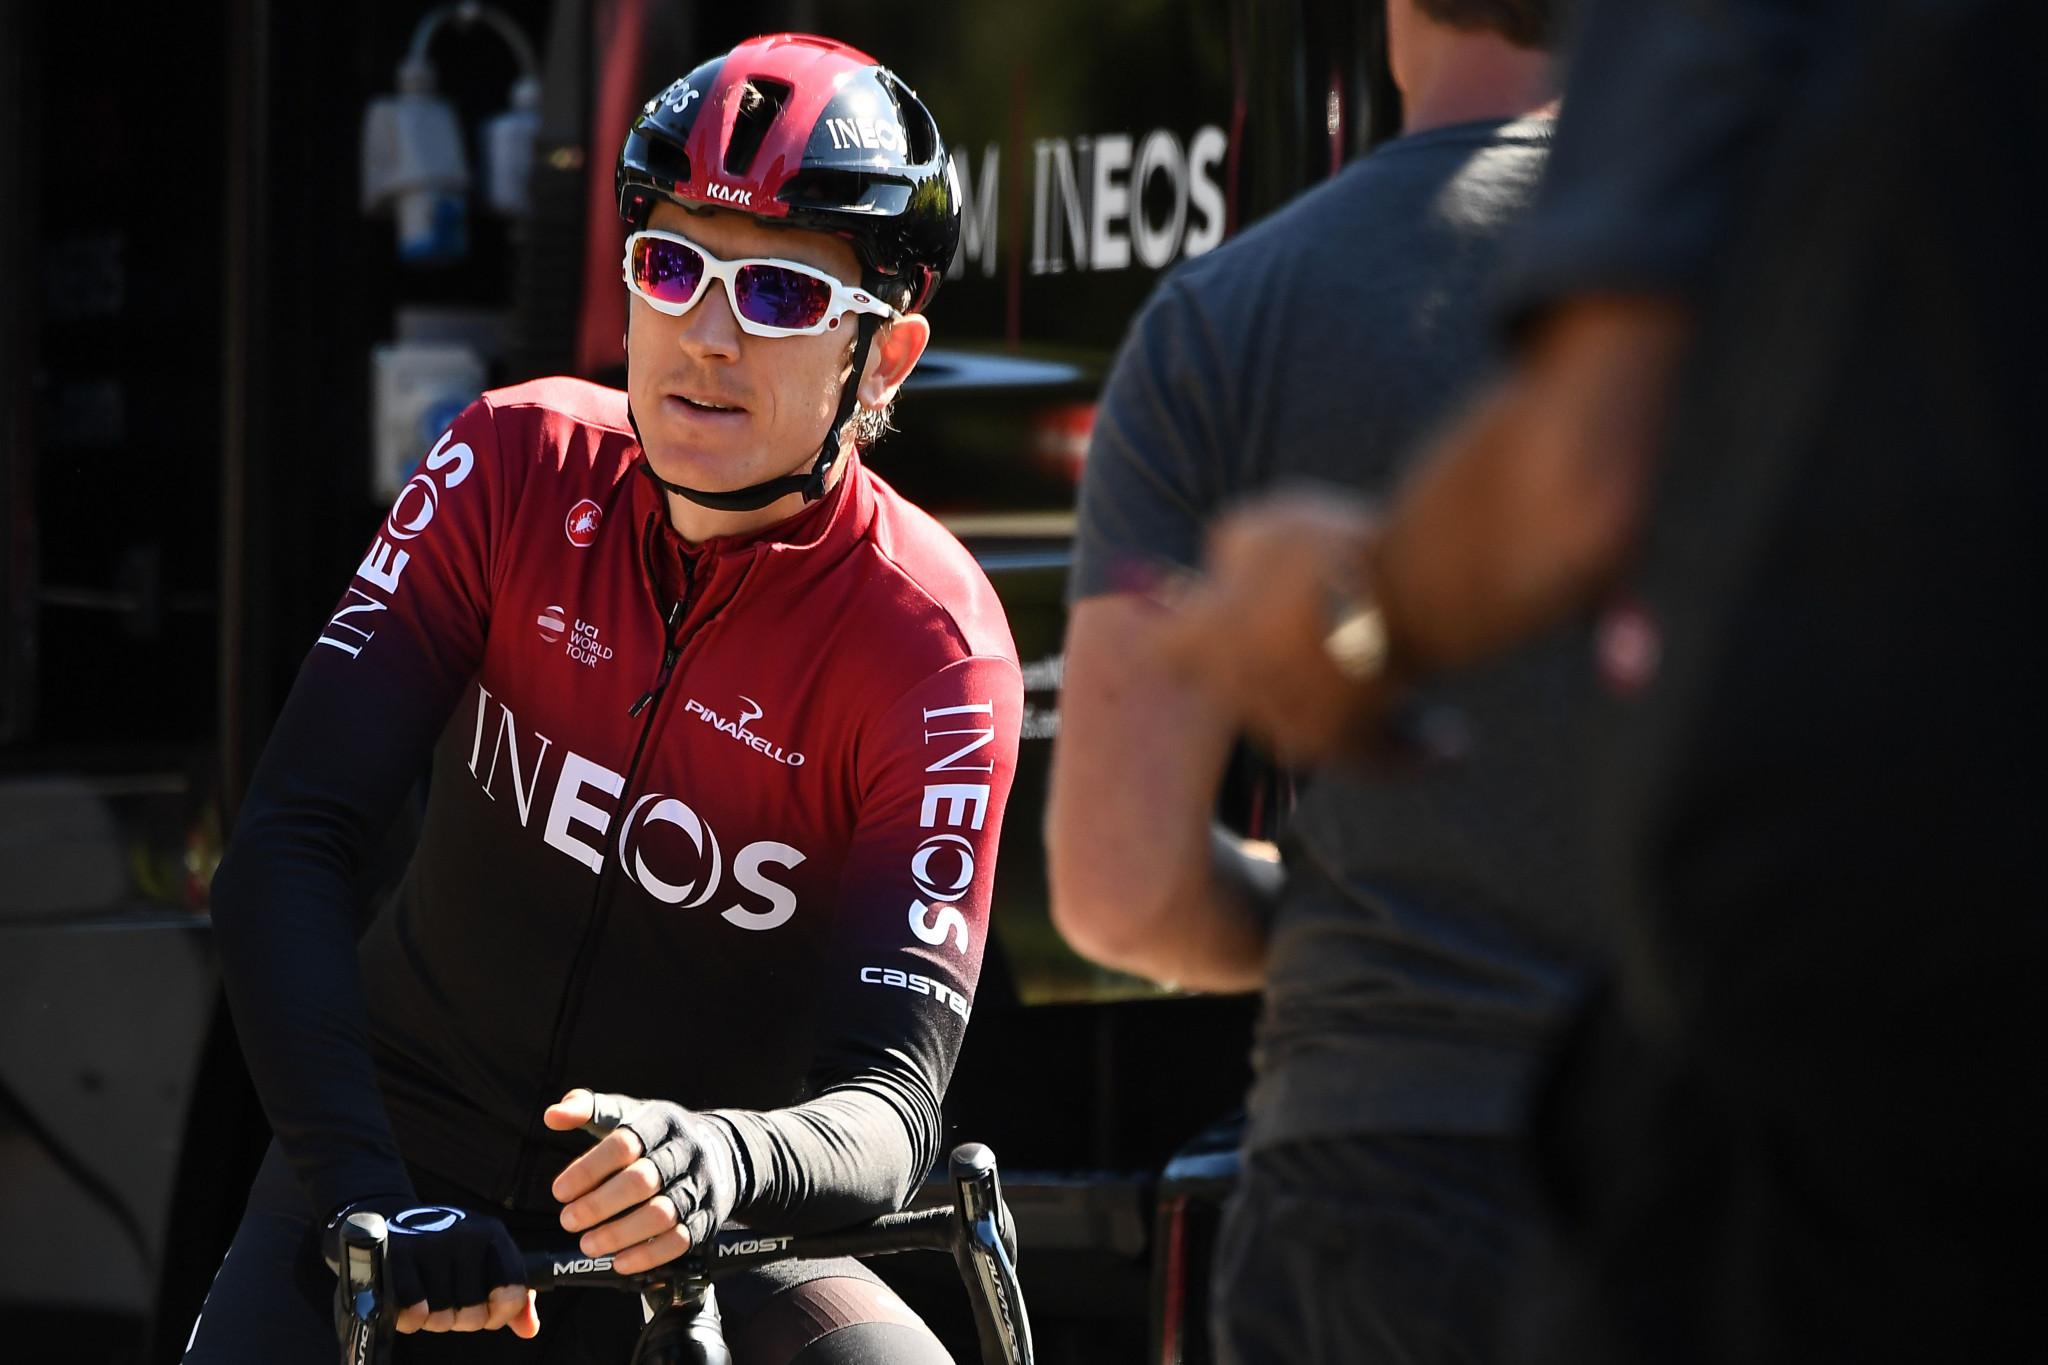 Defending champion Thomas confident in Bernal partnership ahead of Tour de France